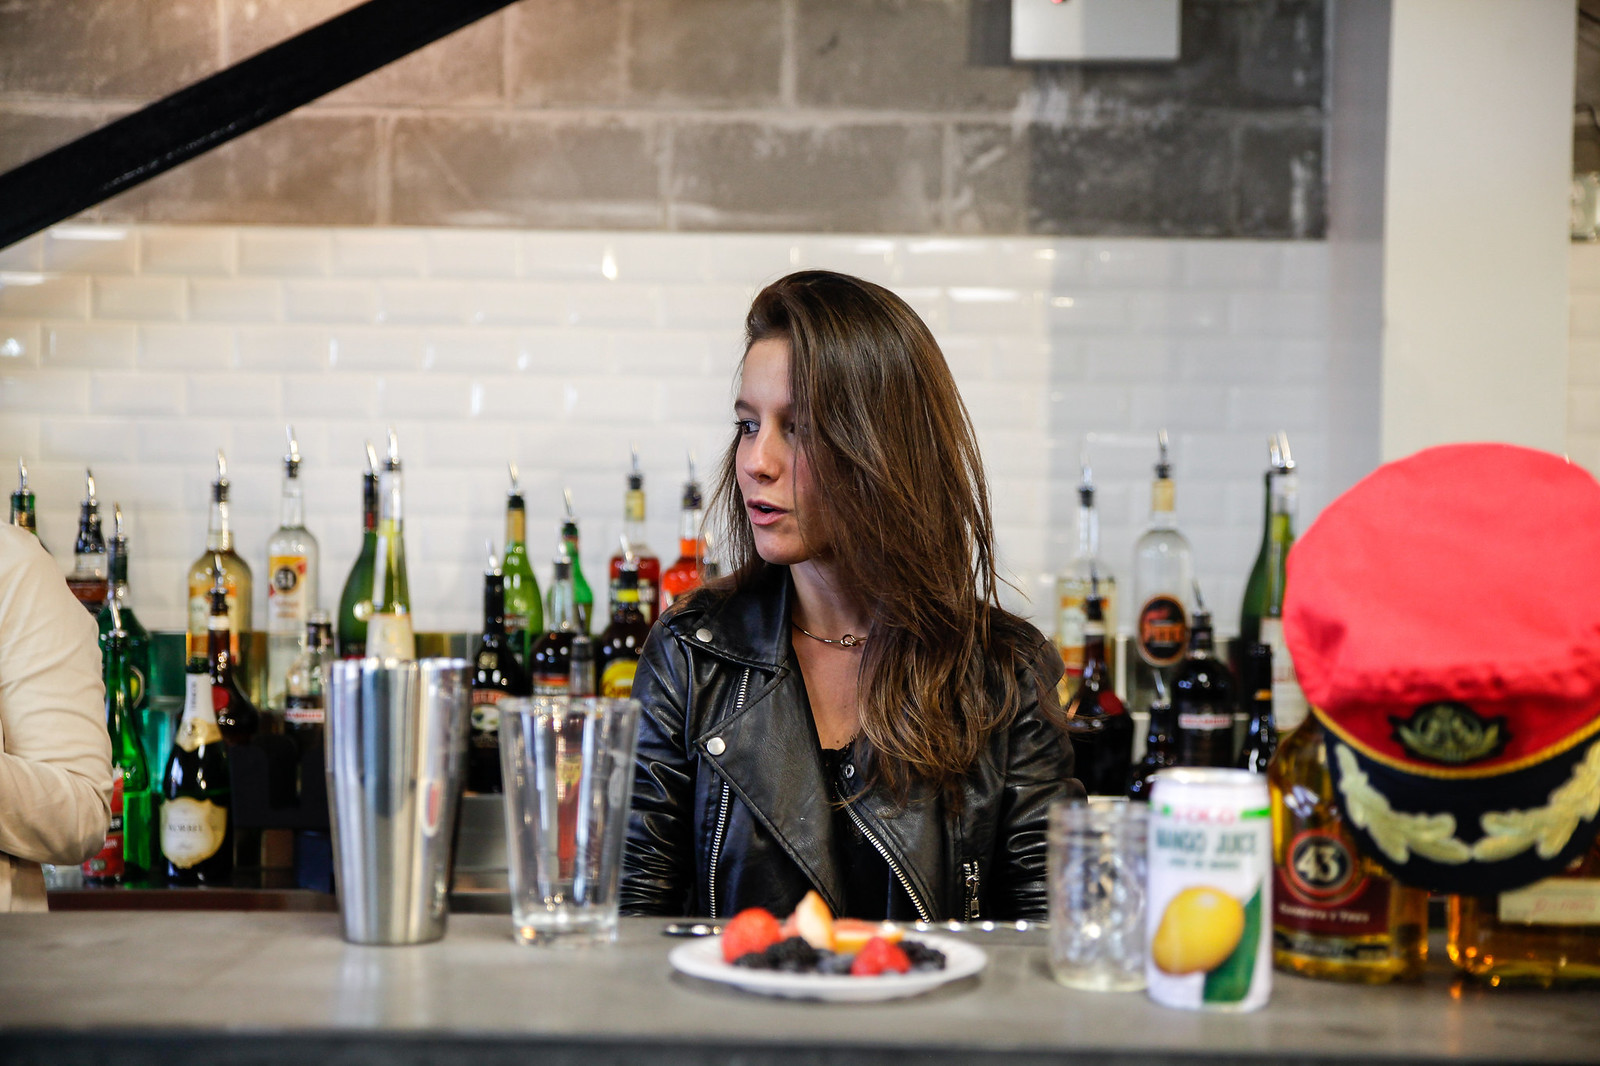 04_European_Bartender_School_new_york_masterclass_cocktails_theguestgirl_travels